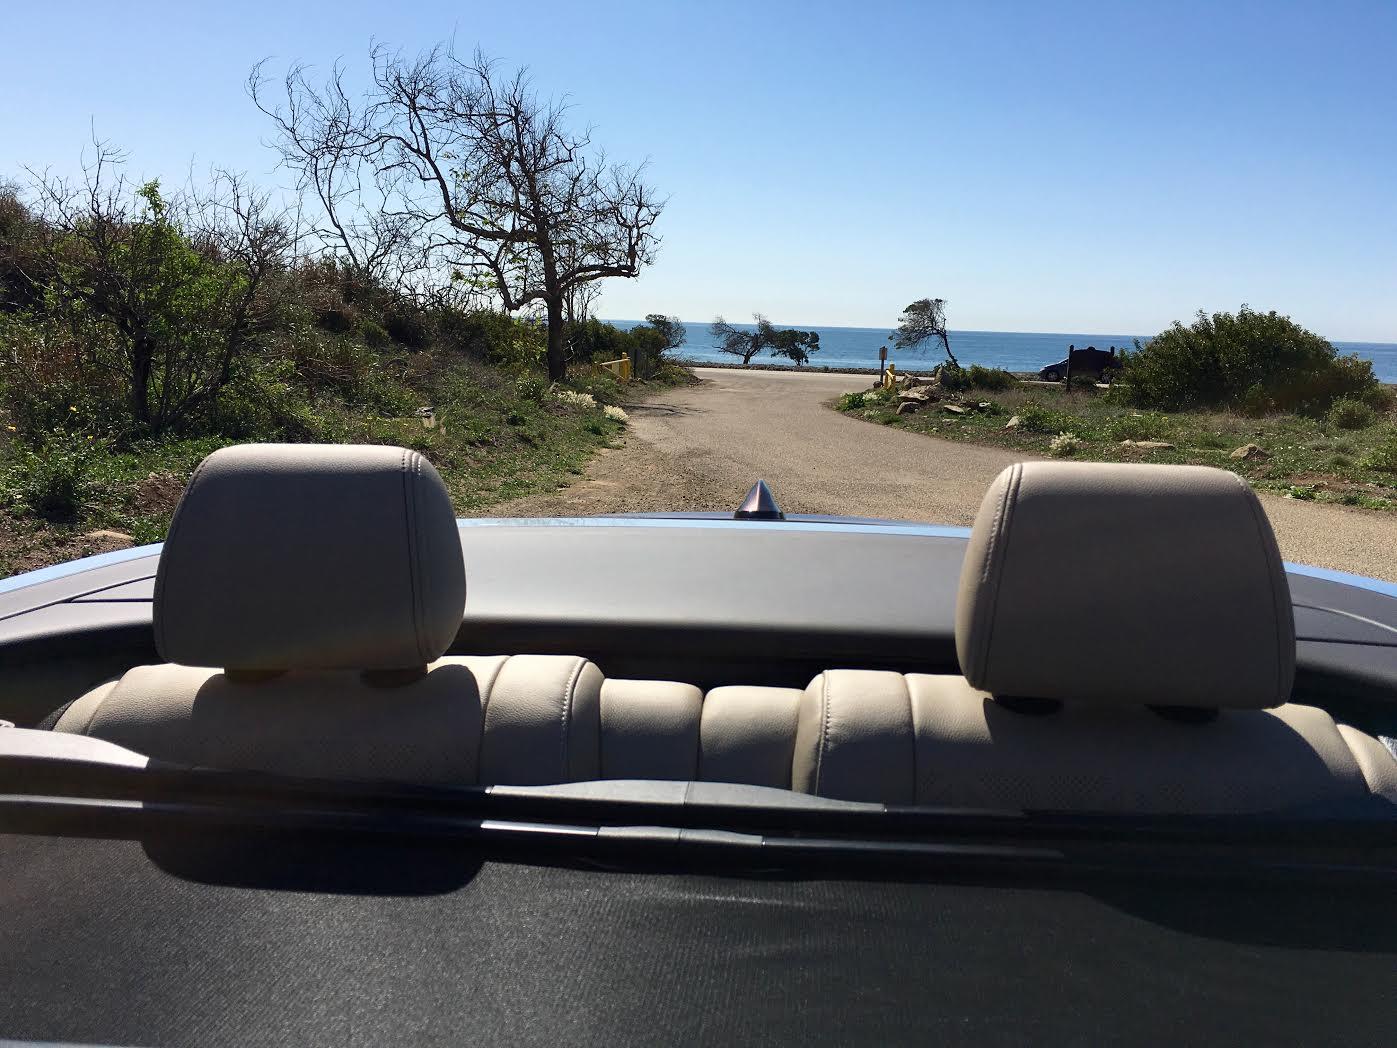 Buick Cascada Convertible Malibu | The JetSet Family